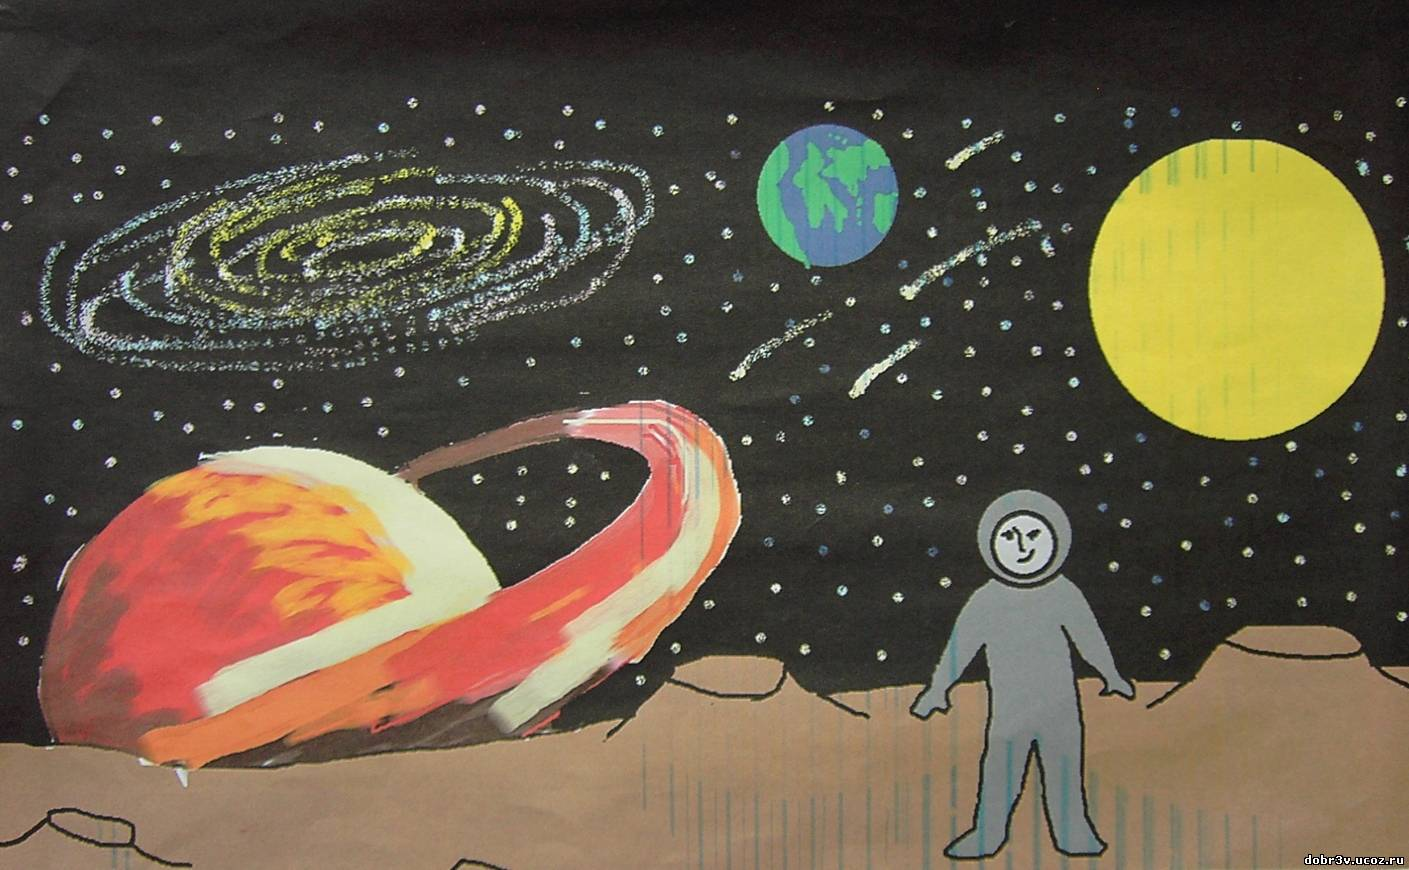 Рисунки о космосе 23 фотография